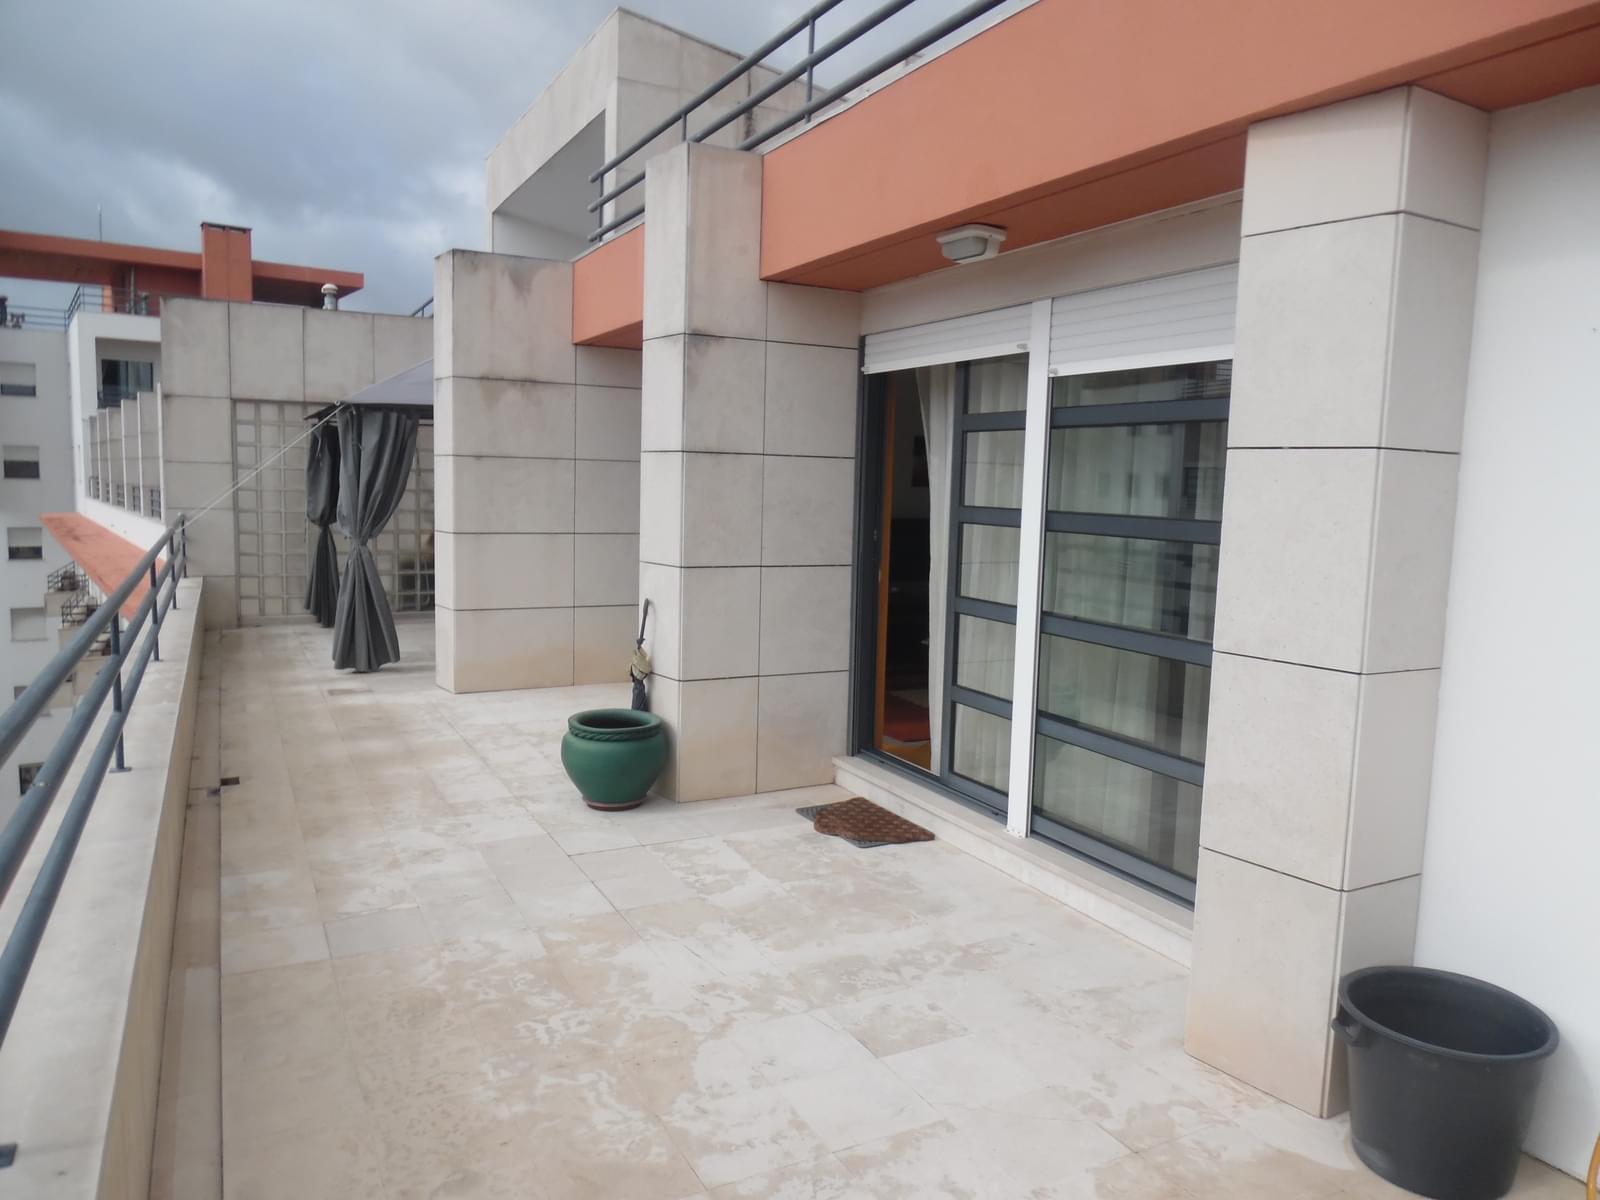 pf18329-apartamento-t1-lisboa-0c6e309e-1751-481a-a4c5-61fb463eb1c8